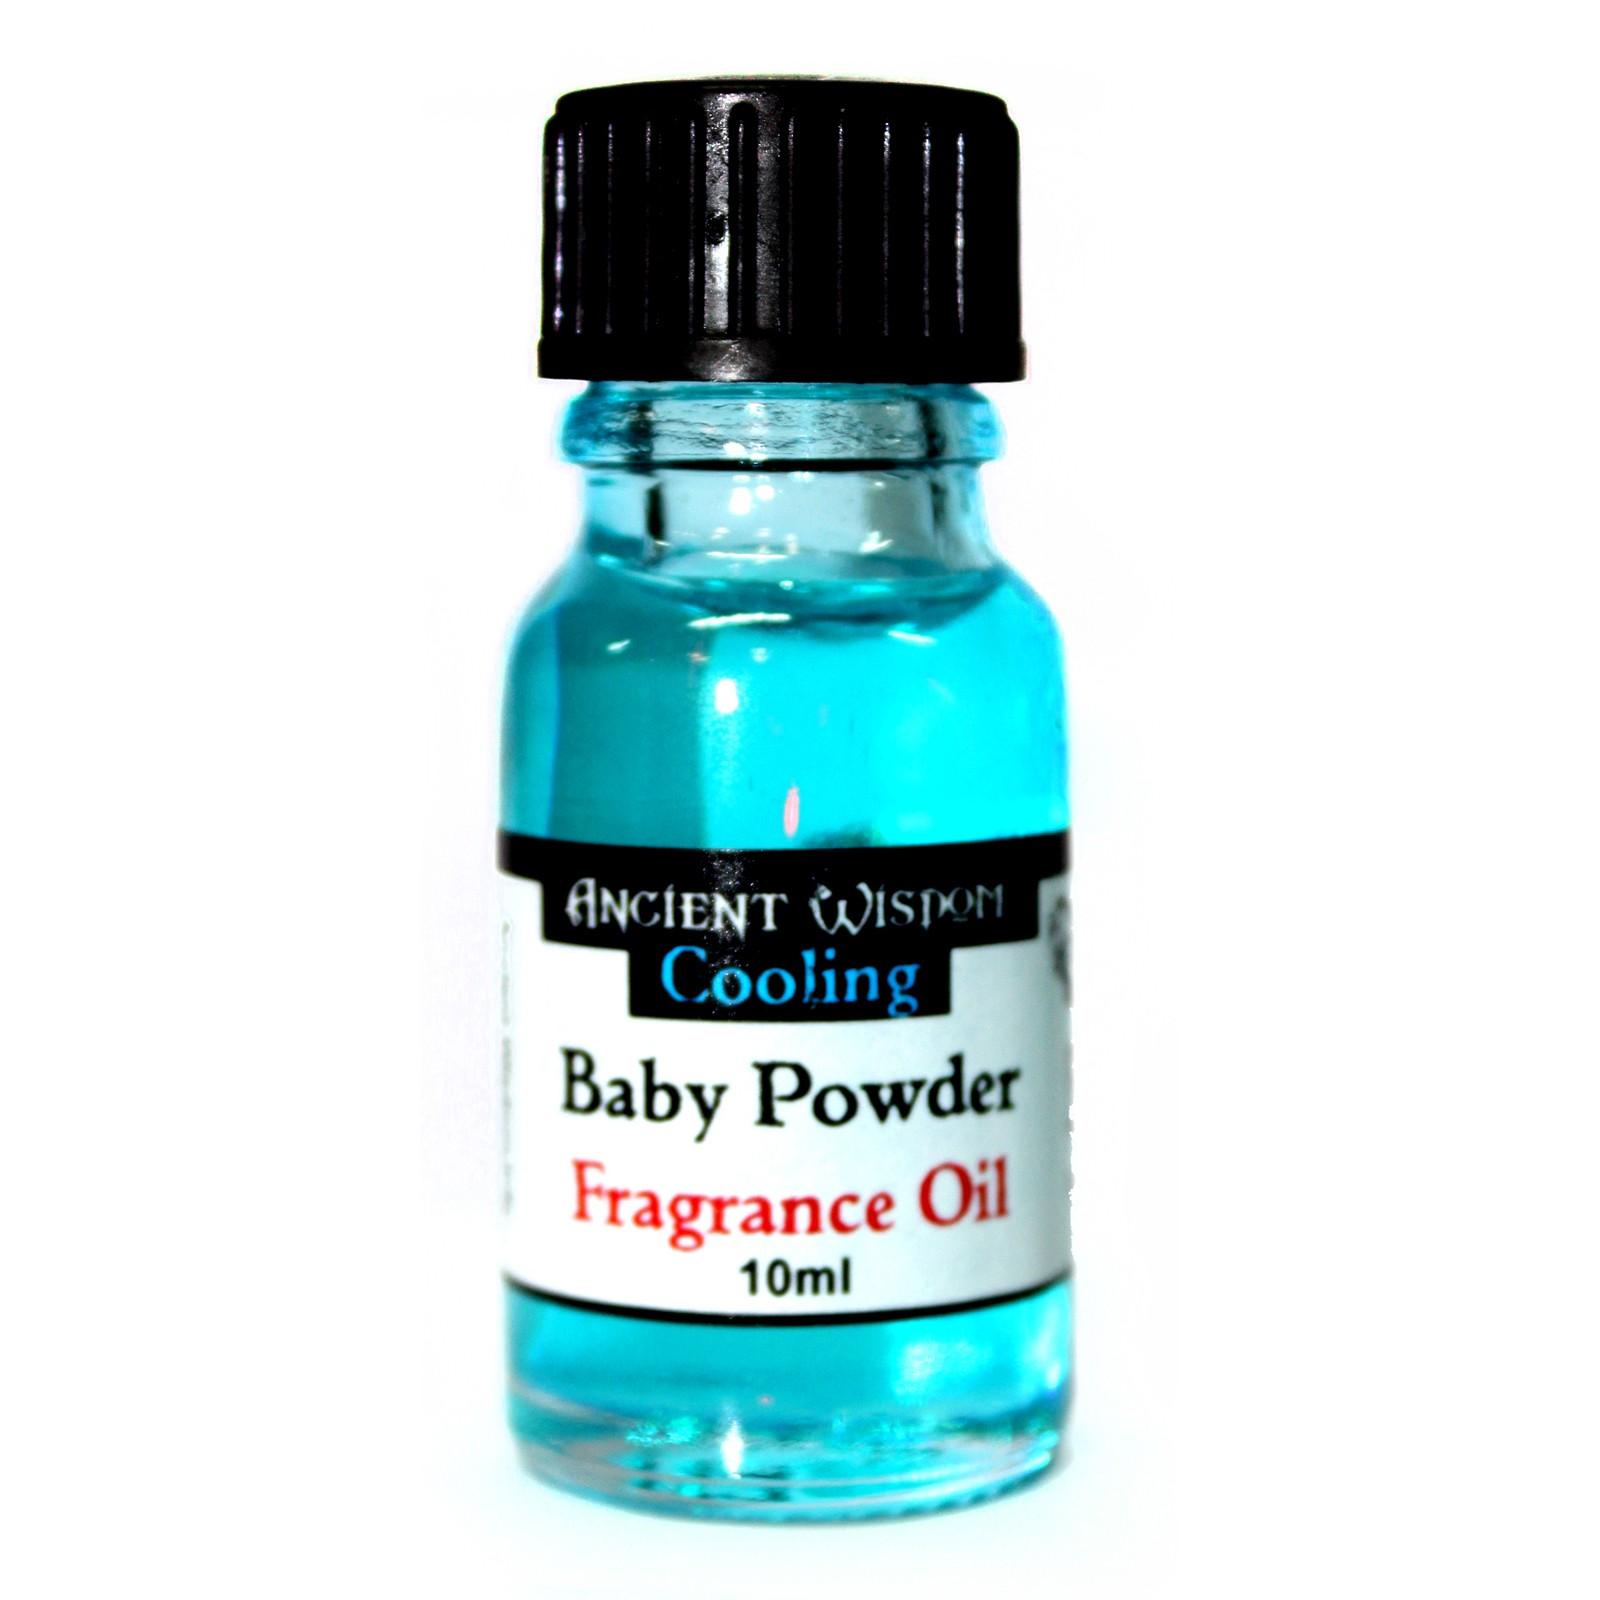 10ml Baby Powder Fragrance Oil